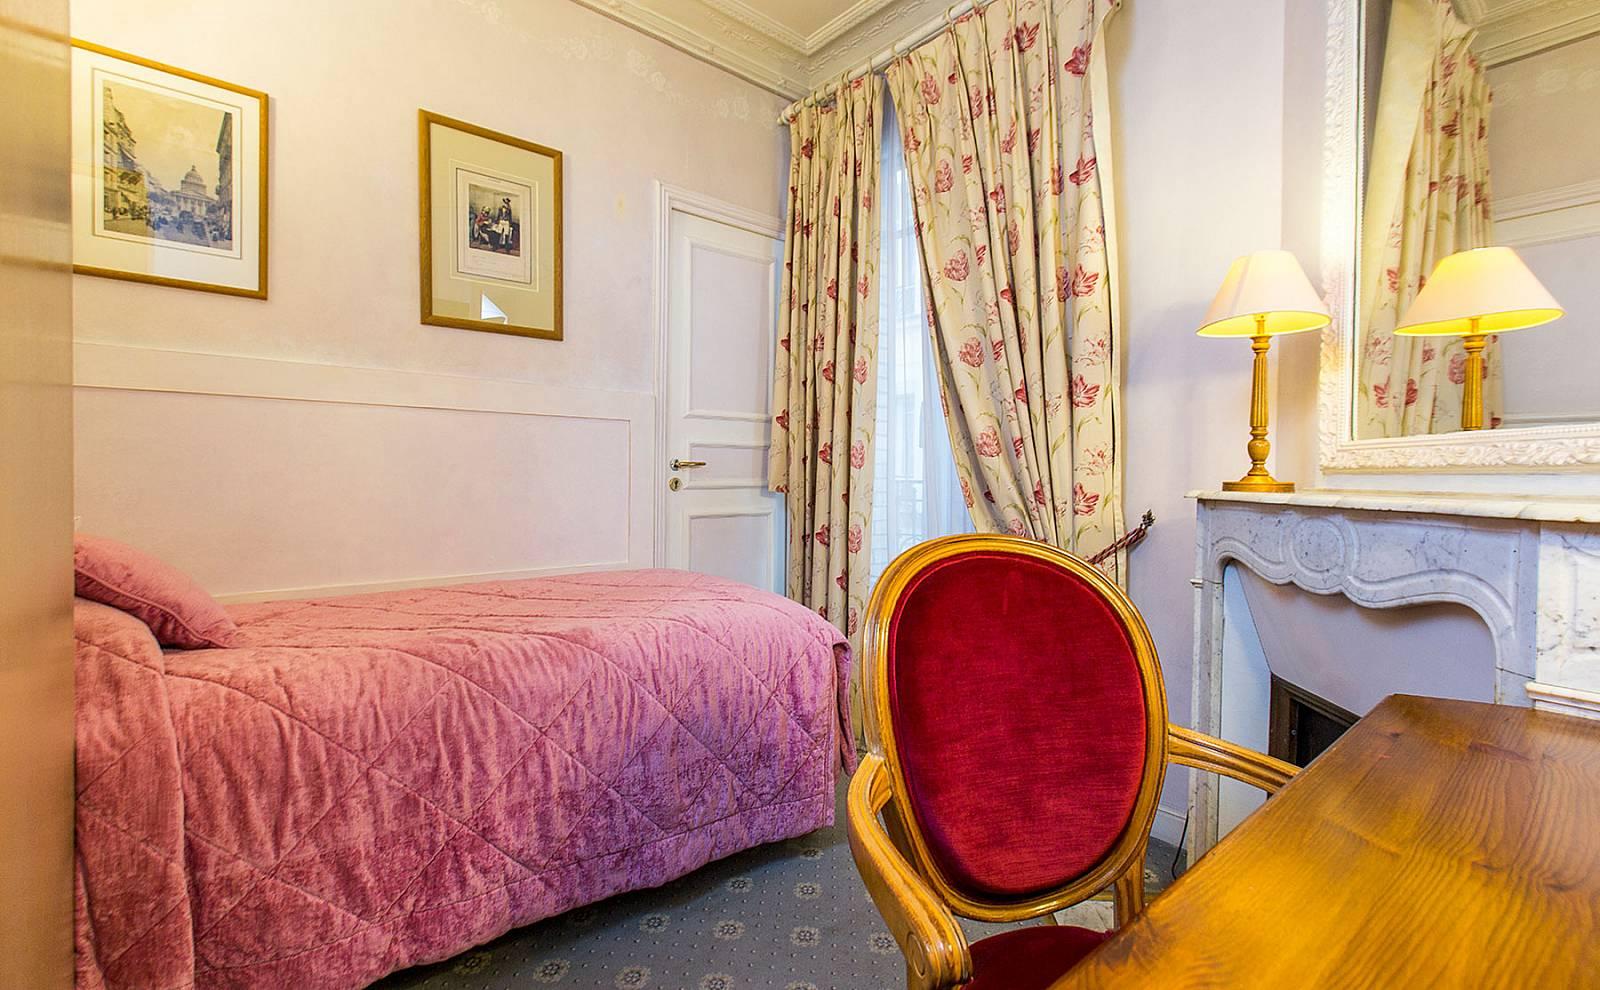 Chambre standard 1 personne hotel gavarni paris - Hotel paris chambre 4 personnes ...